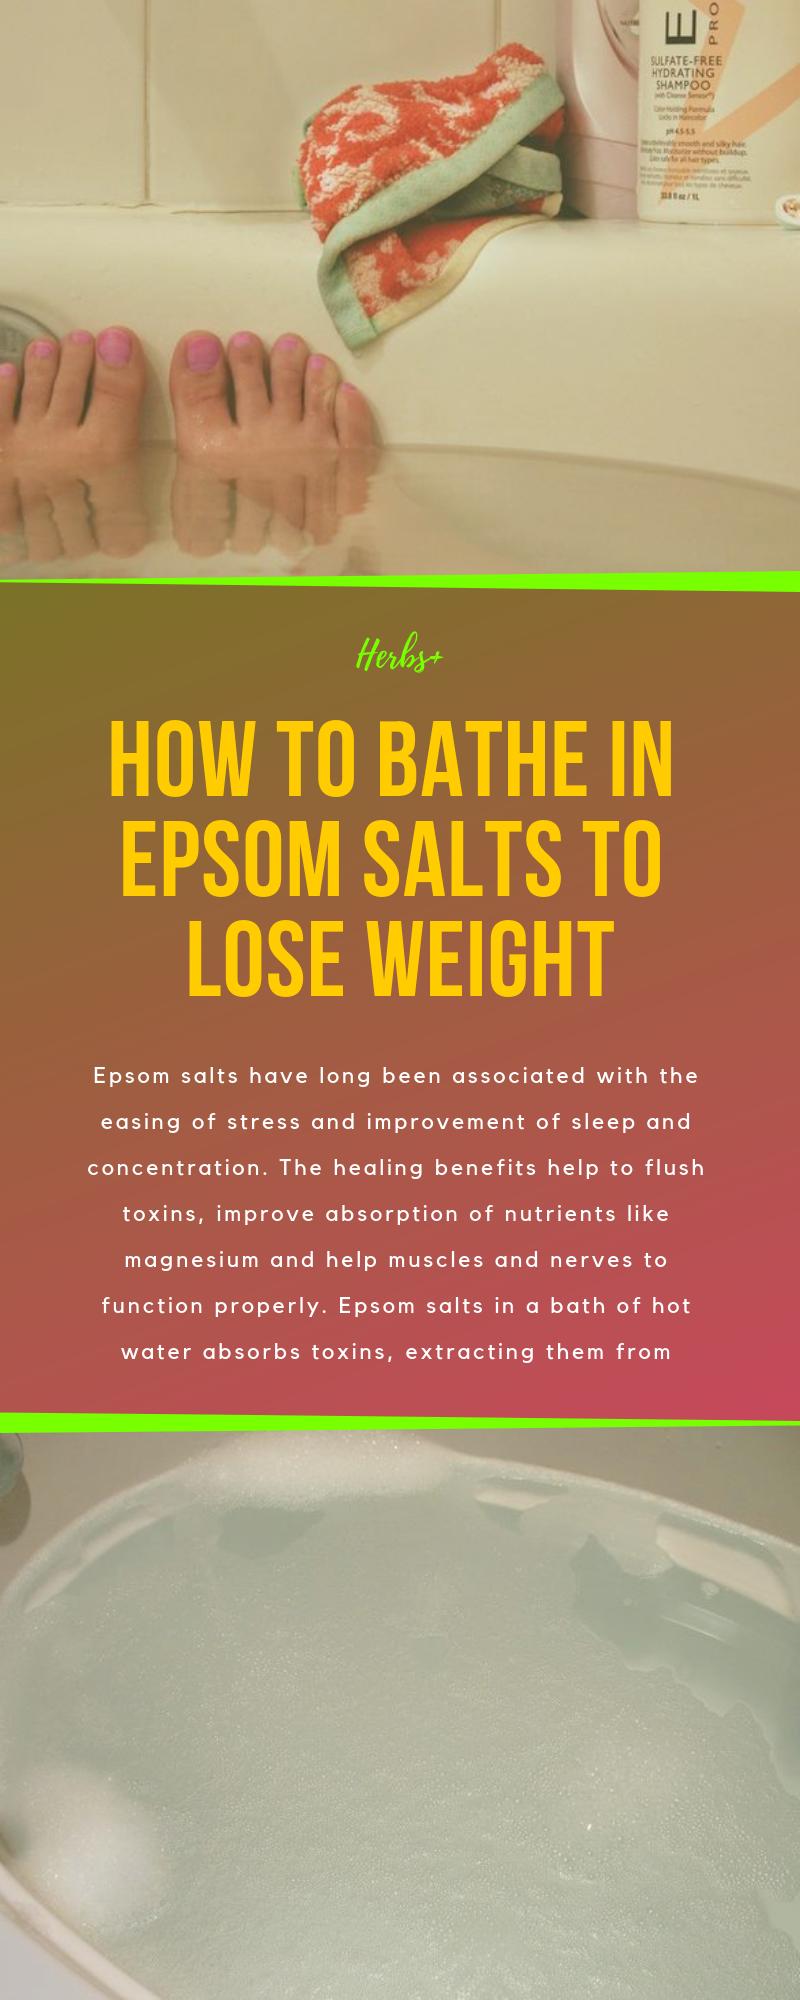 Epsom Salt Weight Loss Drinking : epsom, weight, drinking, Detoxmodela, #detoxmeshop, #detoxday2, #detoxfraise, #detoxtonic, #Detox3dias, #detoxfactory, #detoxamoorea, #de…, Benefits,, Natural, Detox, Drinks,, Benefits